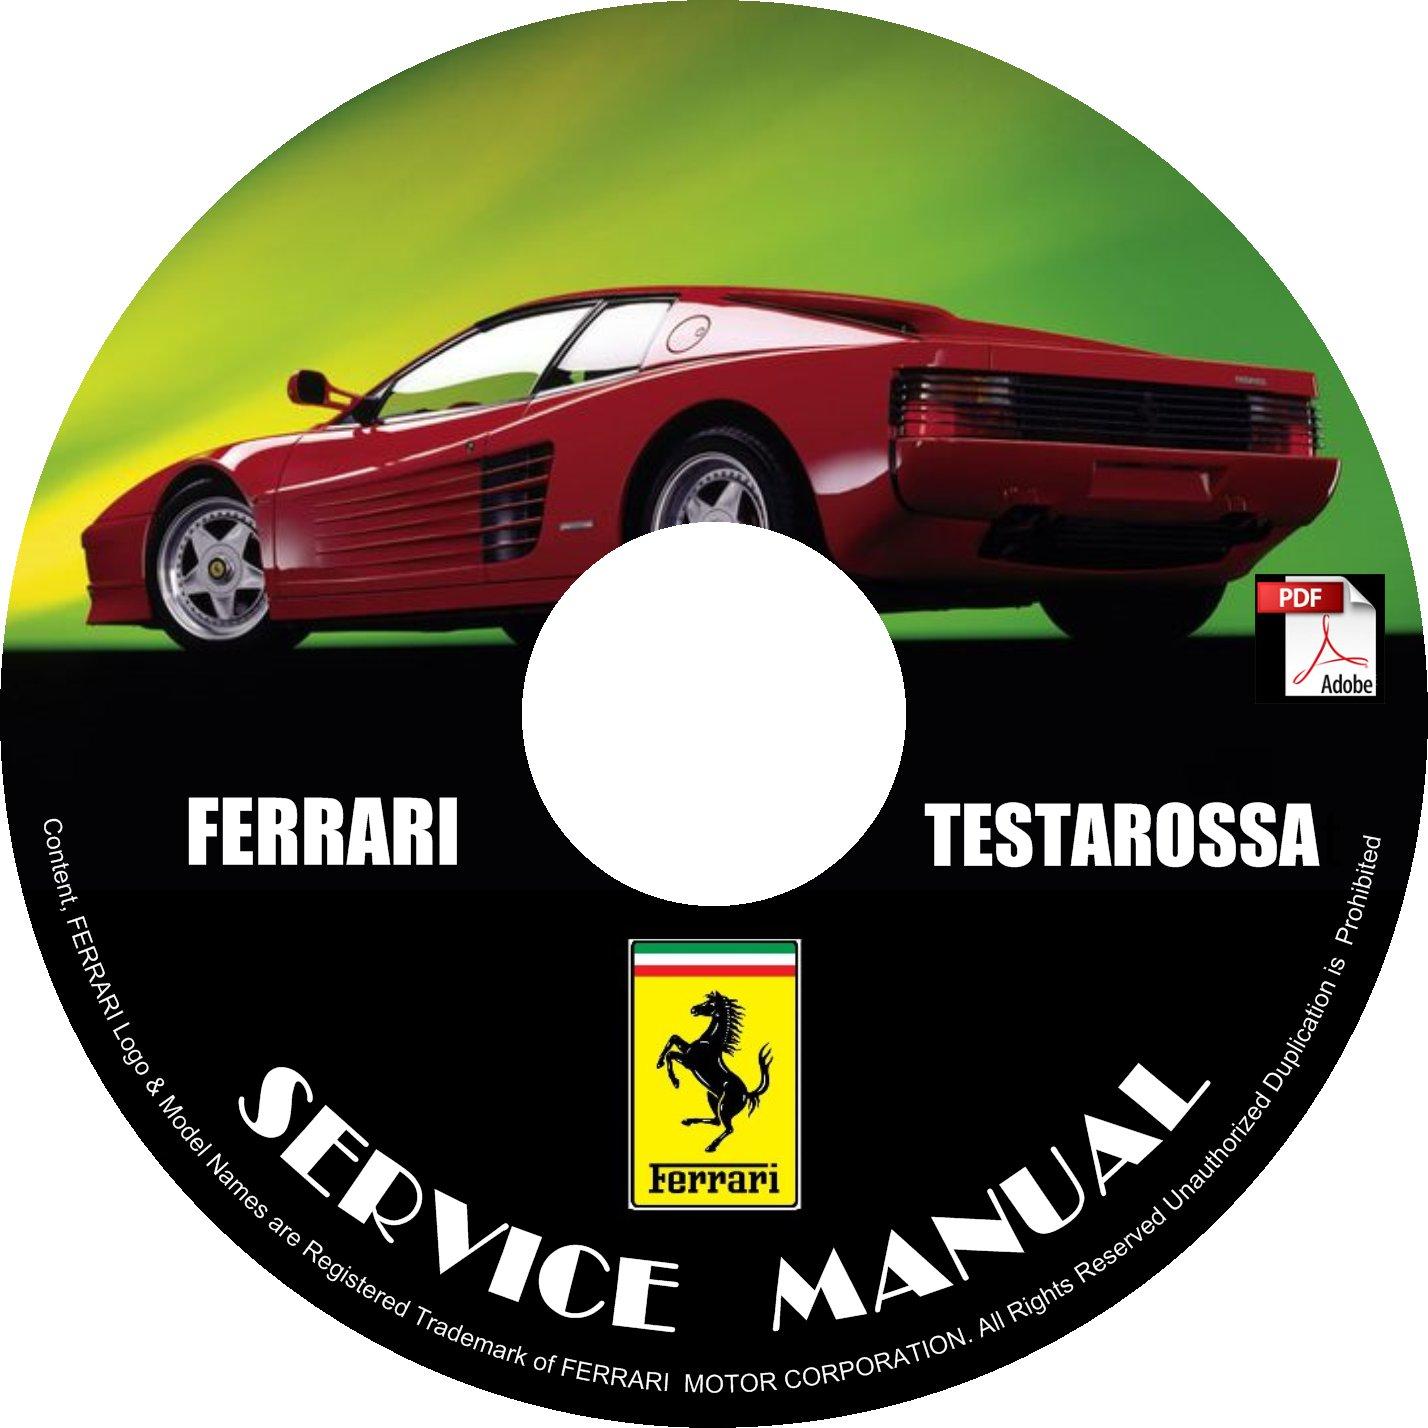 1986 Ferrari Testarossa Factory Service Repair Shop Manual on CD Fix Rebuilt